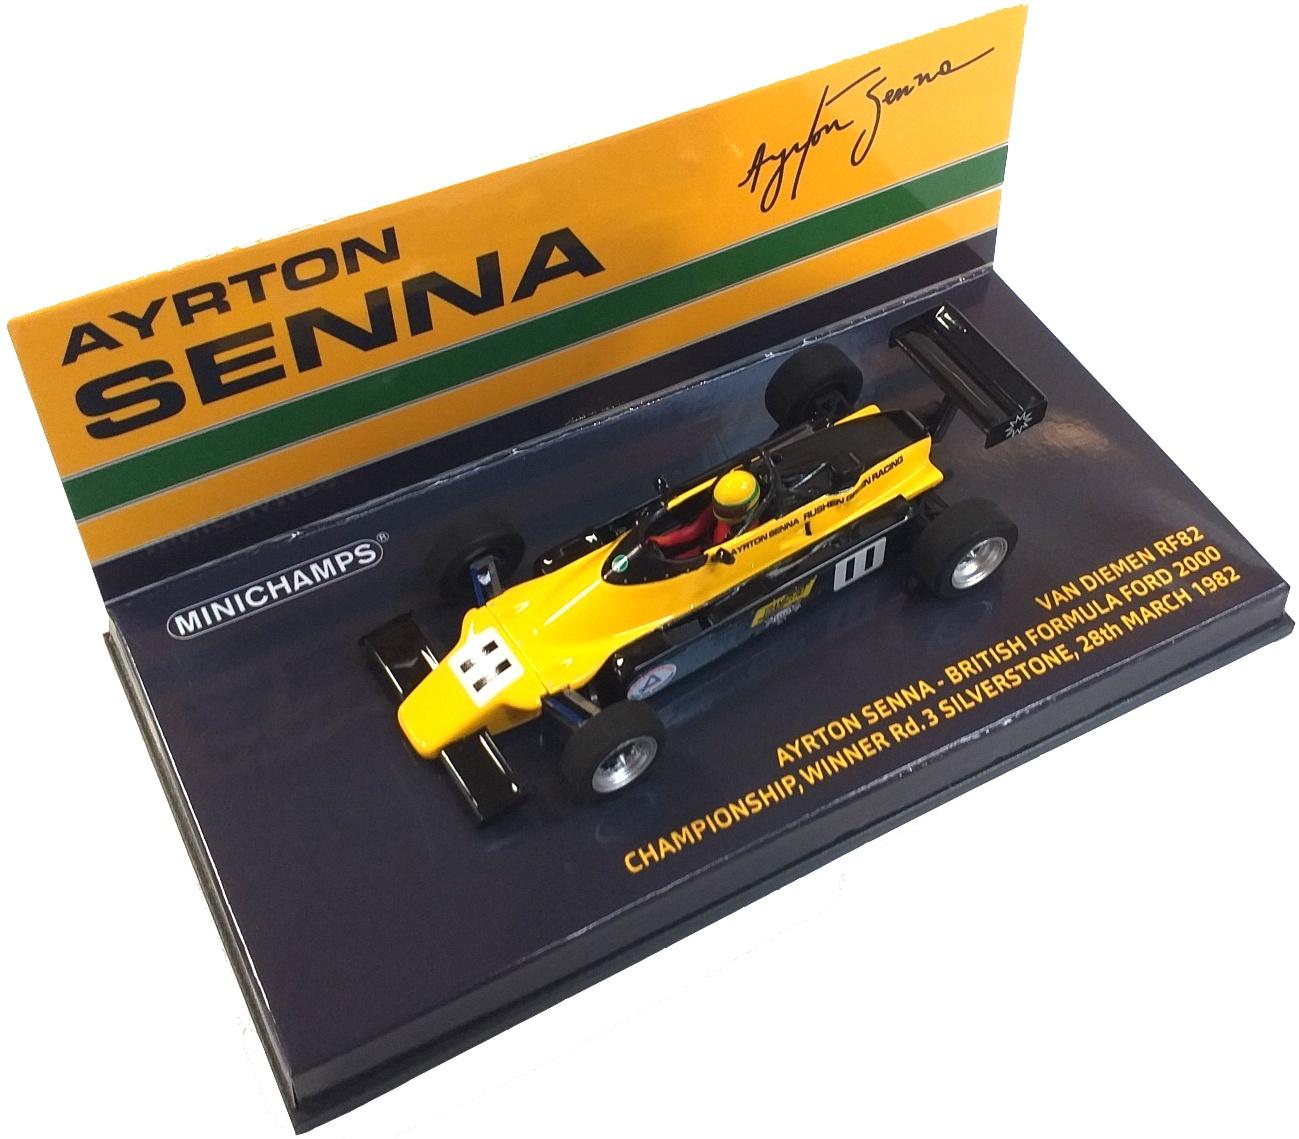 Van Diemen RF82 Ayrton Senna British Formula Ford 2000 Championship Winner Rd. 3 Silverstone 28th March 1982 1/43